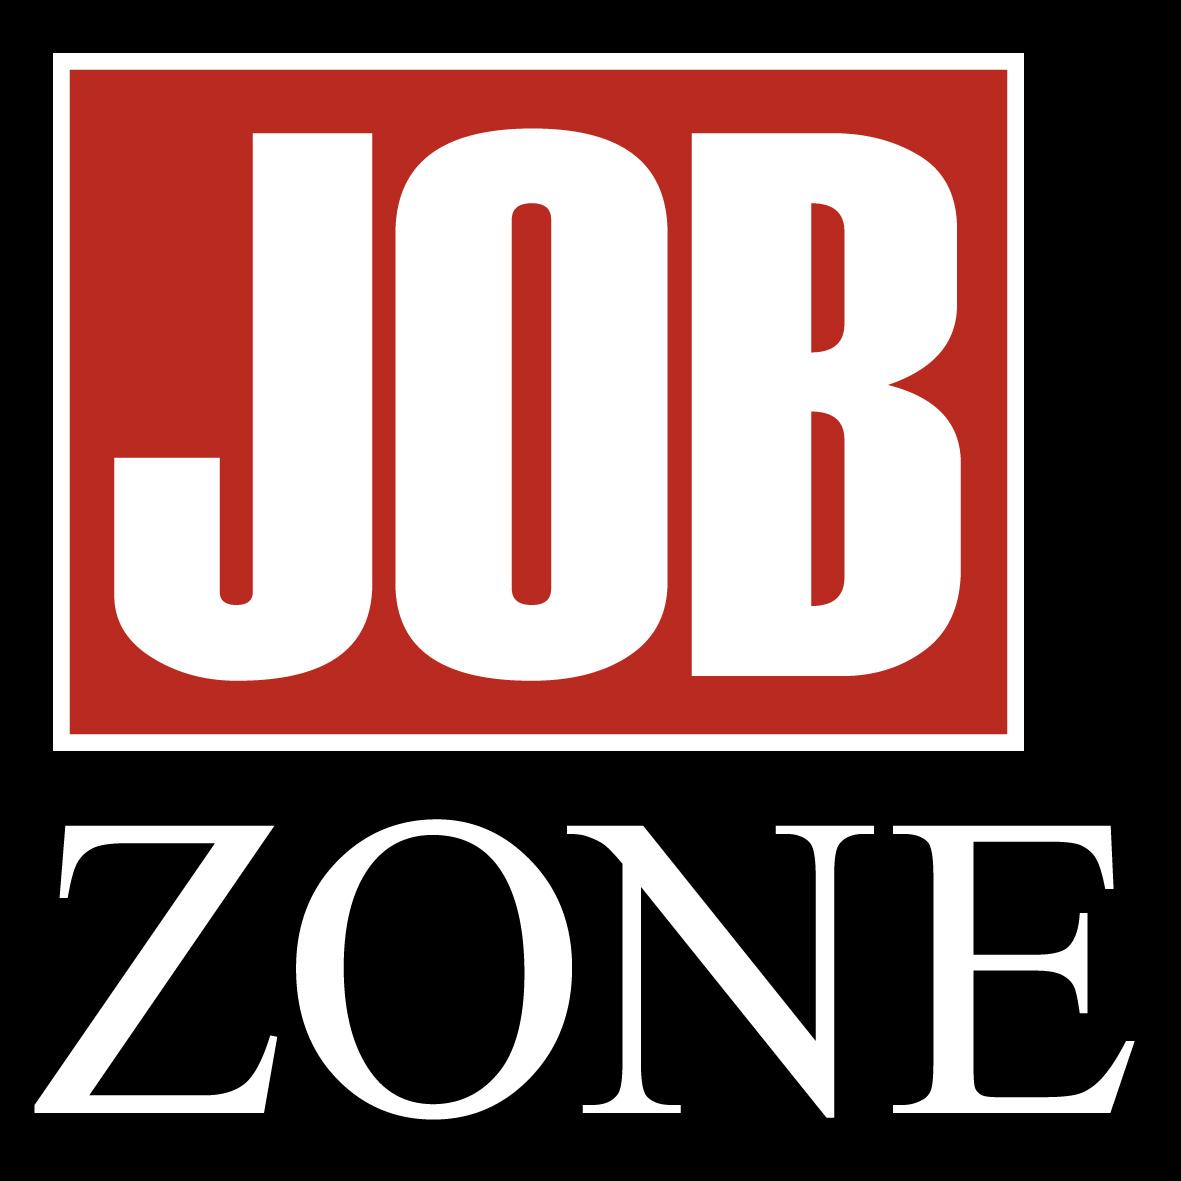 https://smaalenenecup.no/wp-content/uploads/2018/05/jobzone-logo-rgb.jpg